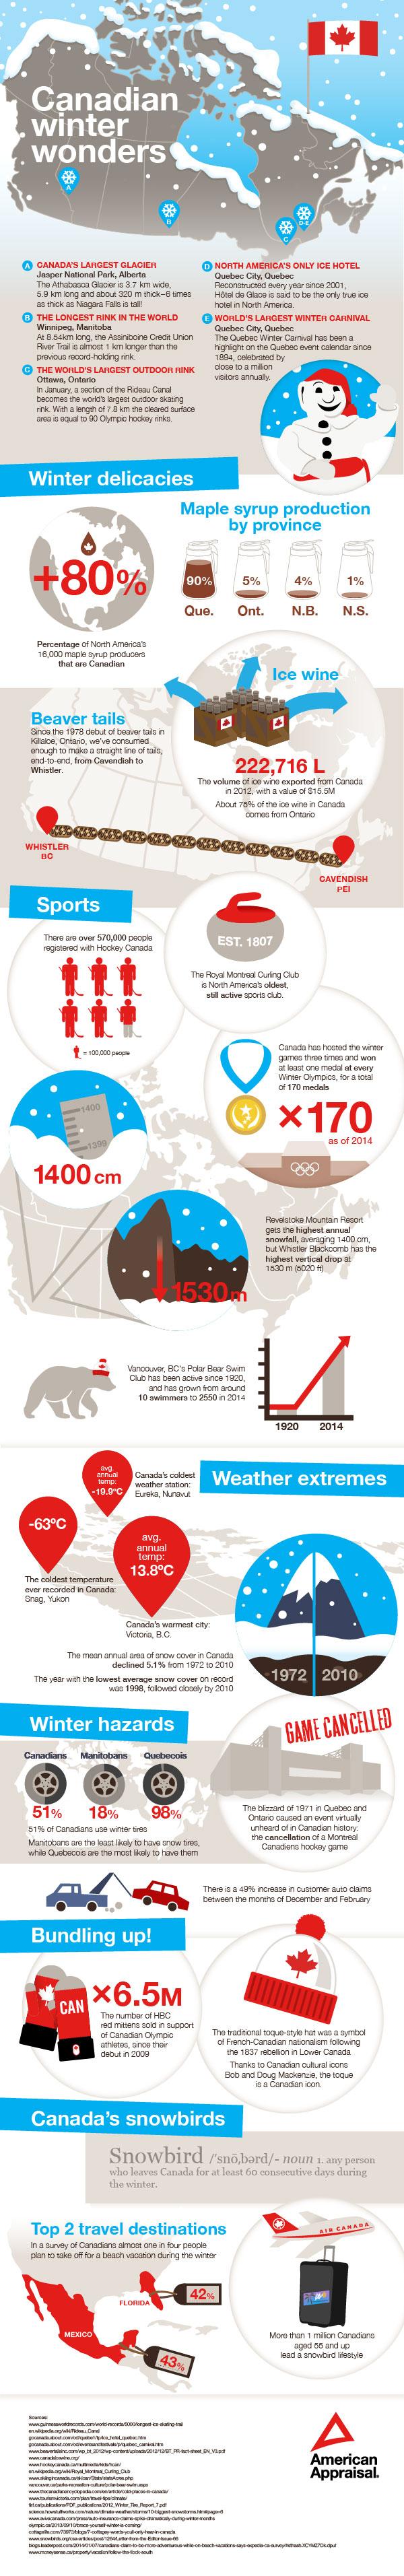 Canadian Winter Wonders